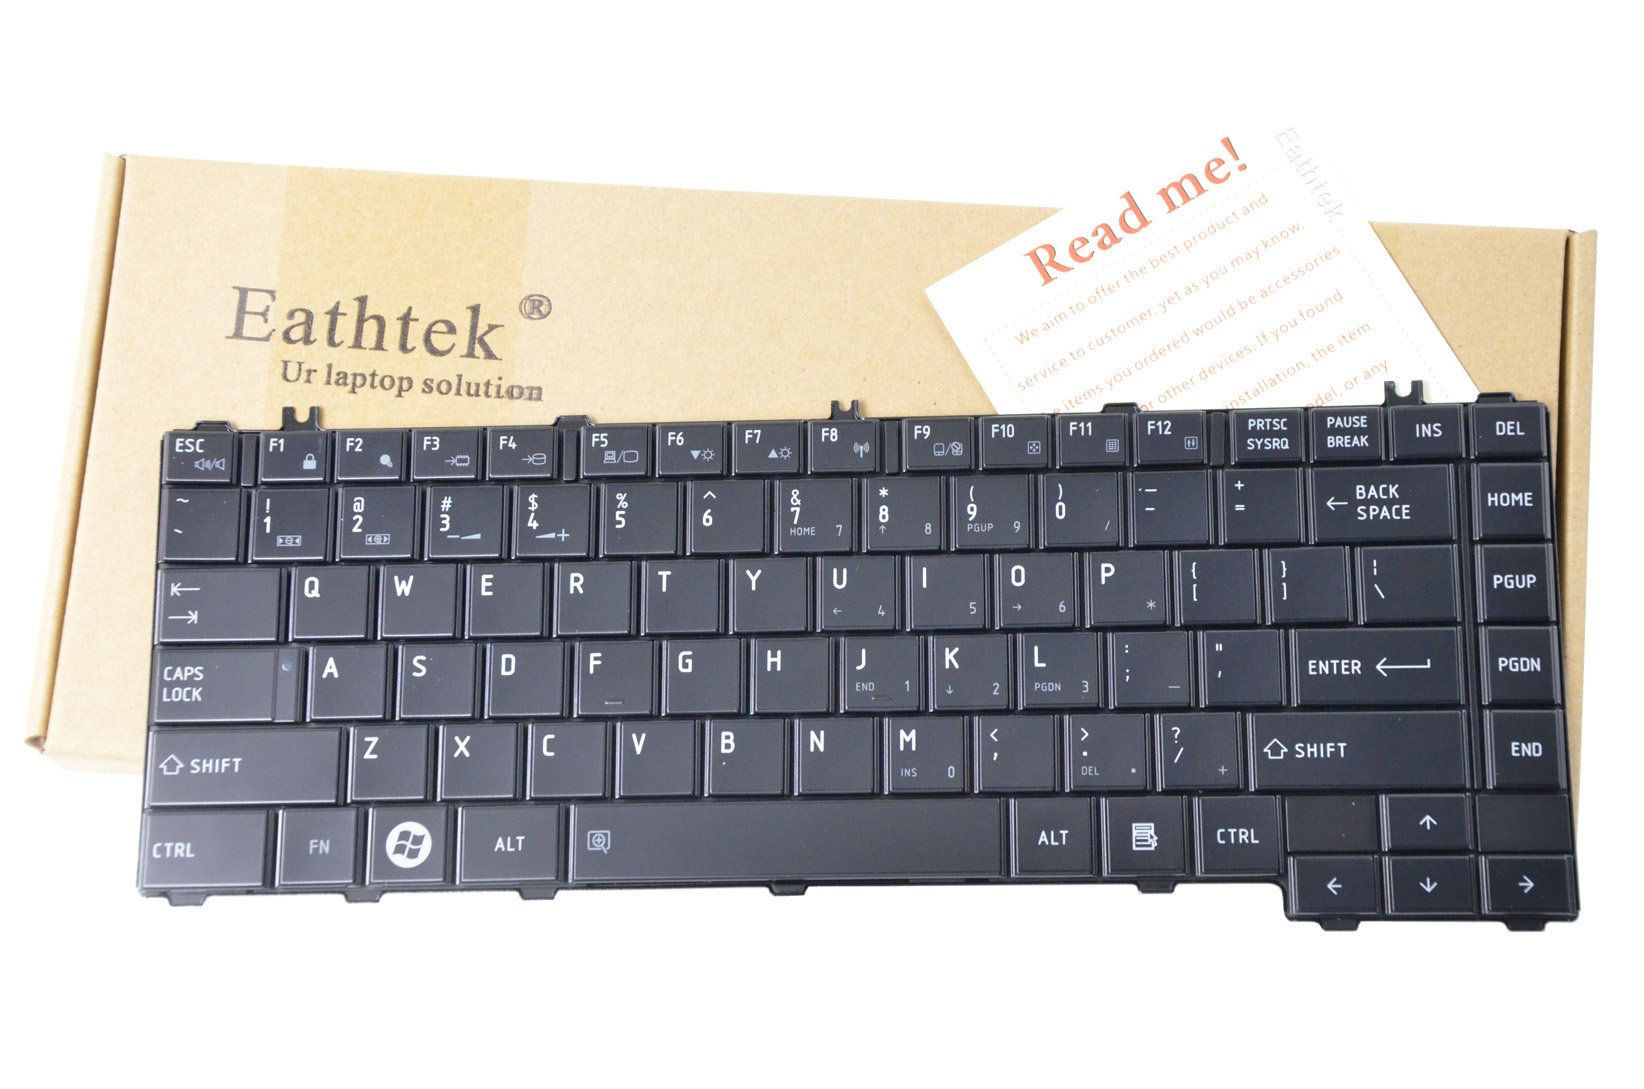 Eathtek New Laptop Keyboard for Toshiba Satellite AETE2P00010-US MP-09M73US6920 NSK-TM0GV 01 9Z.N4VGQ.001 9Z.N4VSQ.001 9Z.N4VGV.001 NSK-TM0GQ AETE2U00010 AETE2U00020 6037B0049202 A000070640 A000070650 A000070720 A000070730 V000240810 V000240070 9Z.N4VGV.001 NSK-TM0GV MP-09M73US-6930 series Glossy